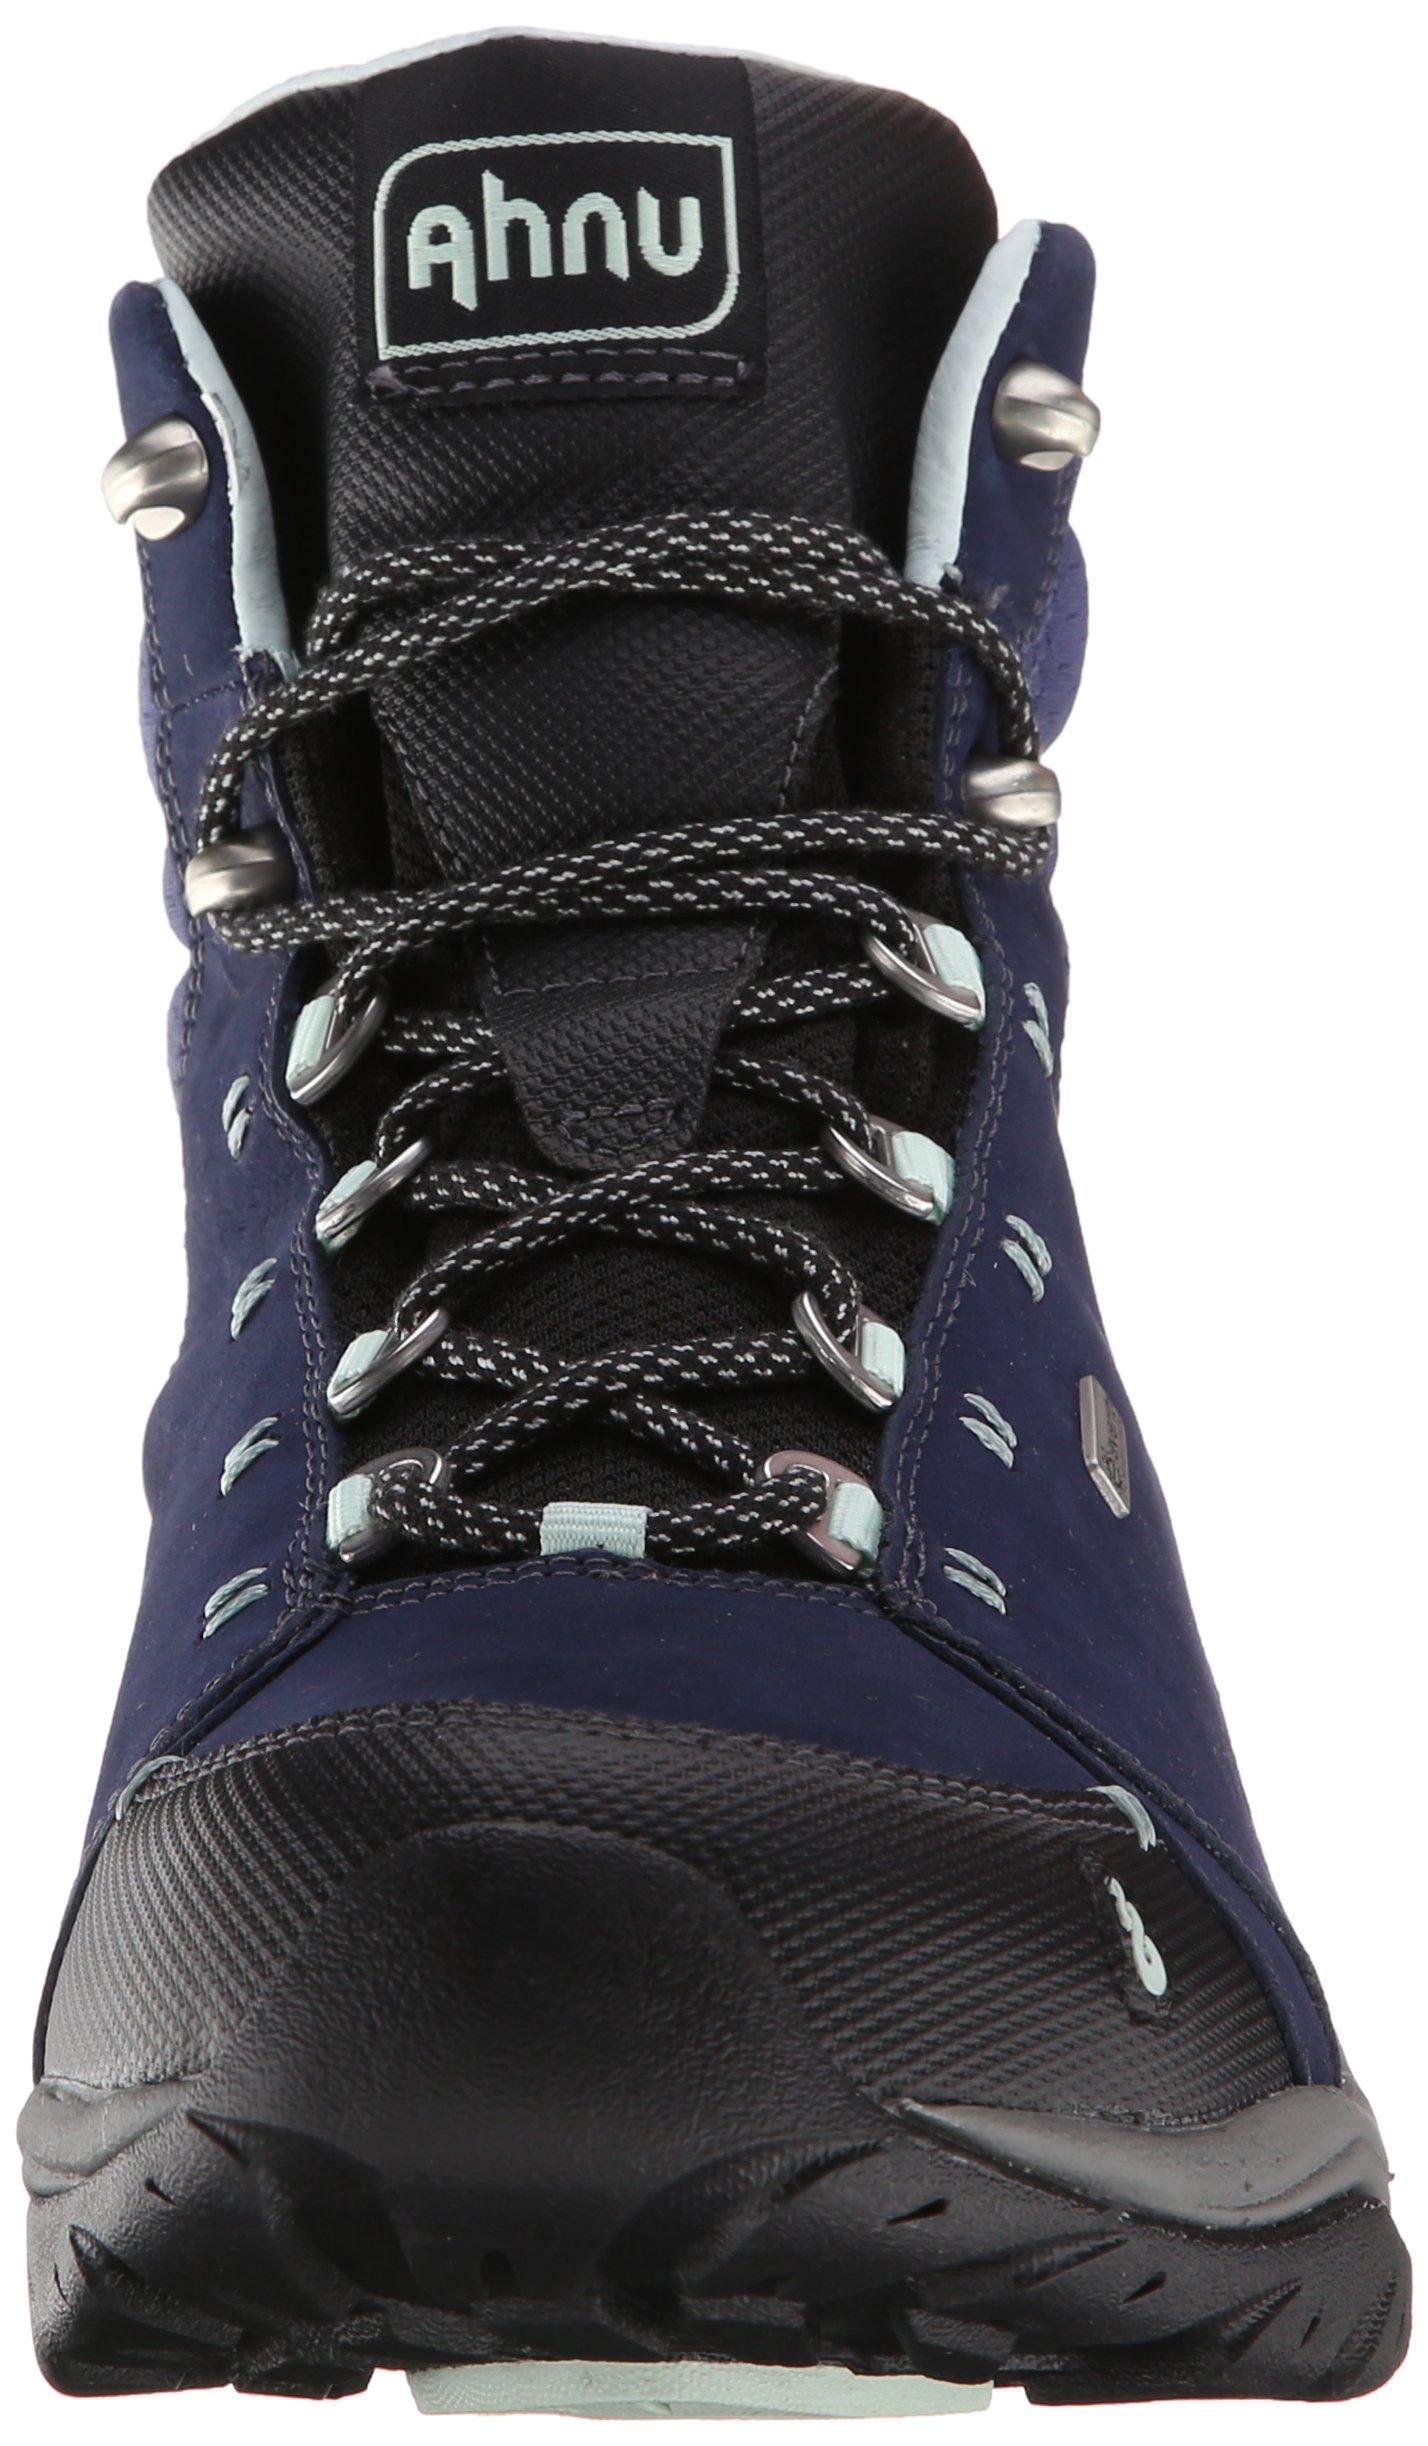 Ahnu Women's Montara Waterproof Boot,Midnight Blue,8 M US by Ahnu (Image #4)